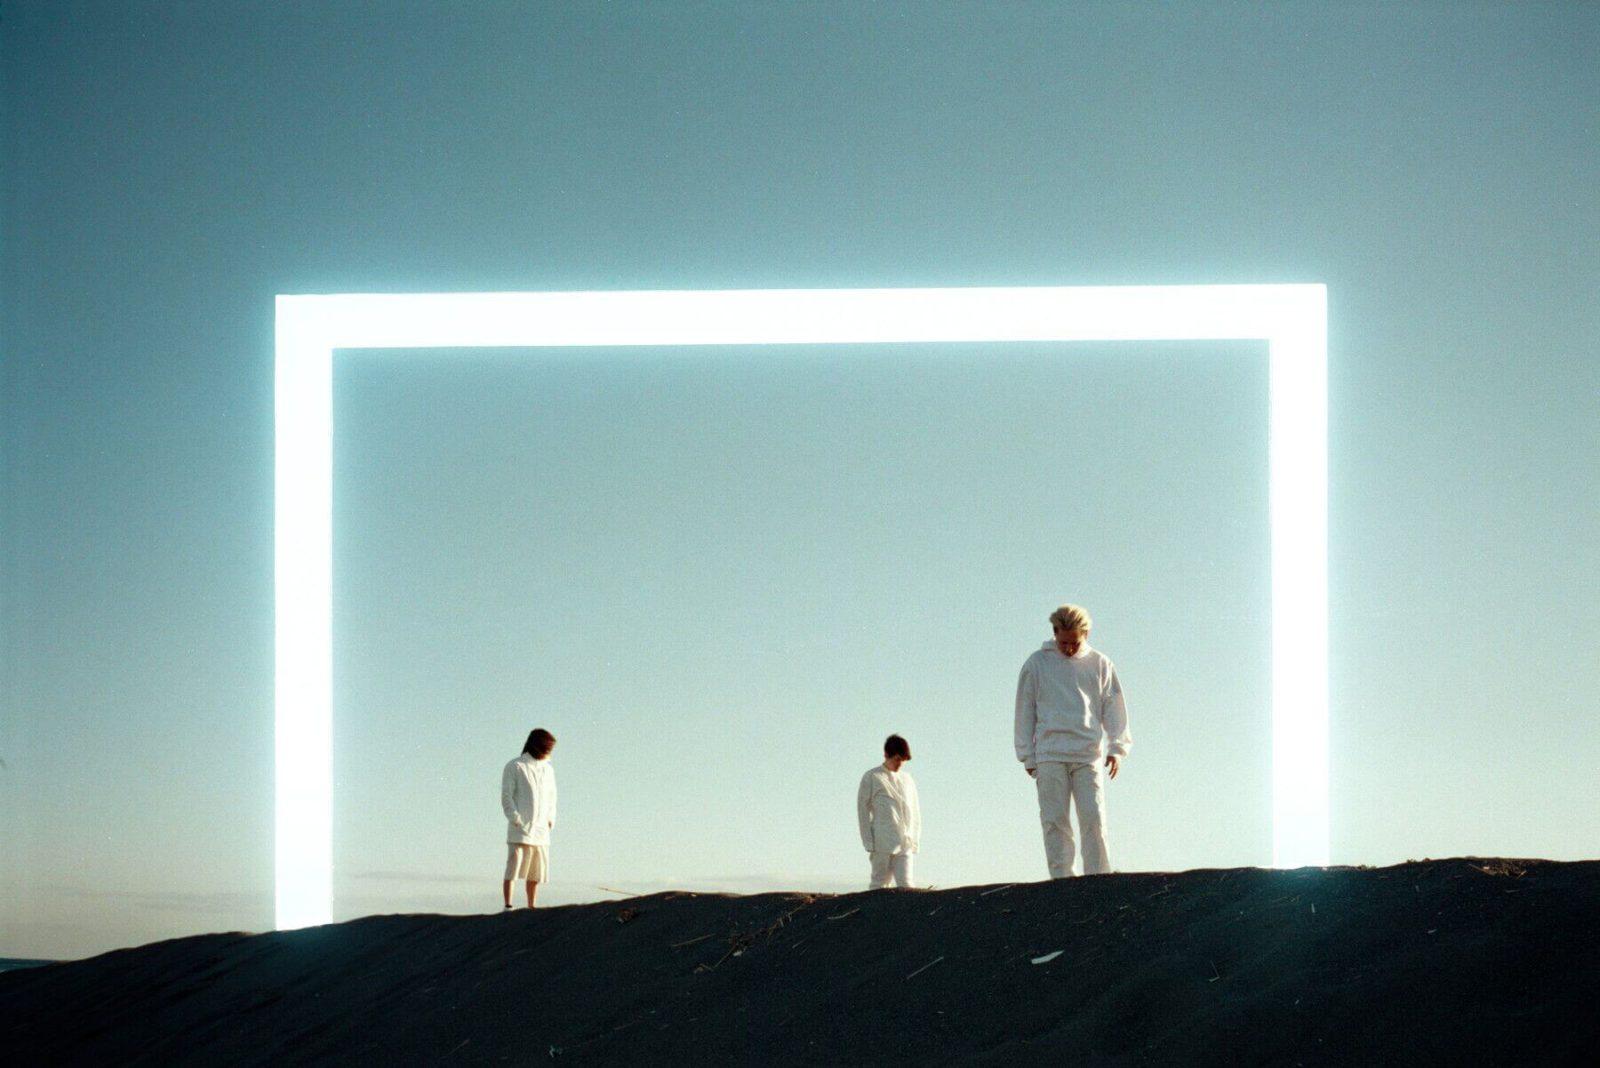 cadode、J-WAVE「SONAR TRAX」選出曲2曲を含む1st mini albumをリリースサムネイル画像